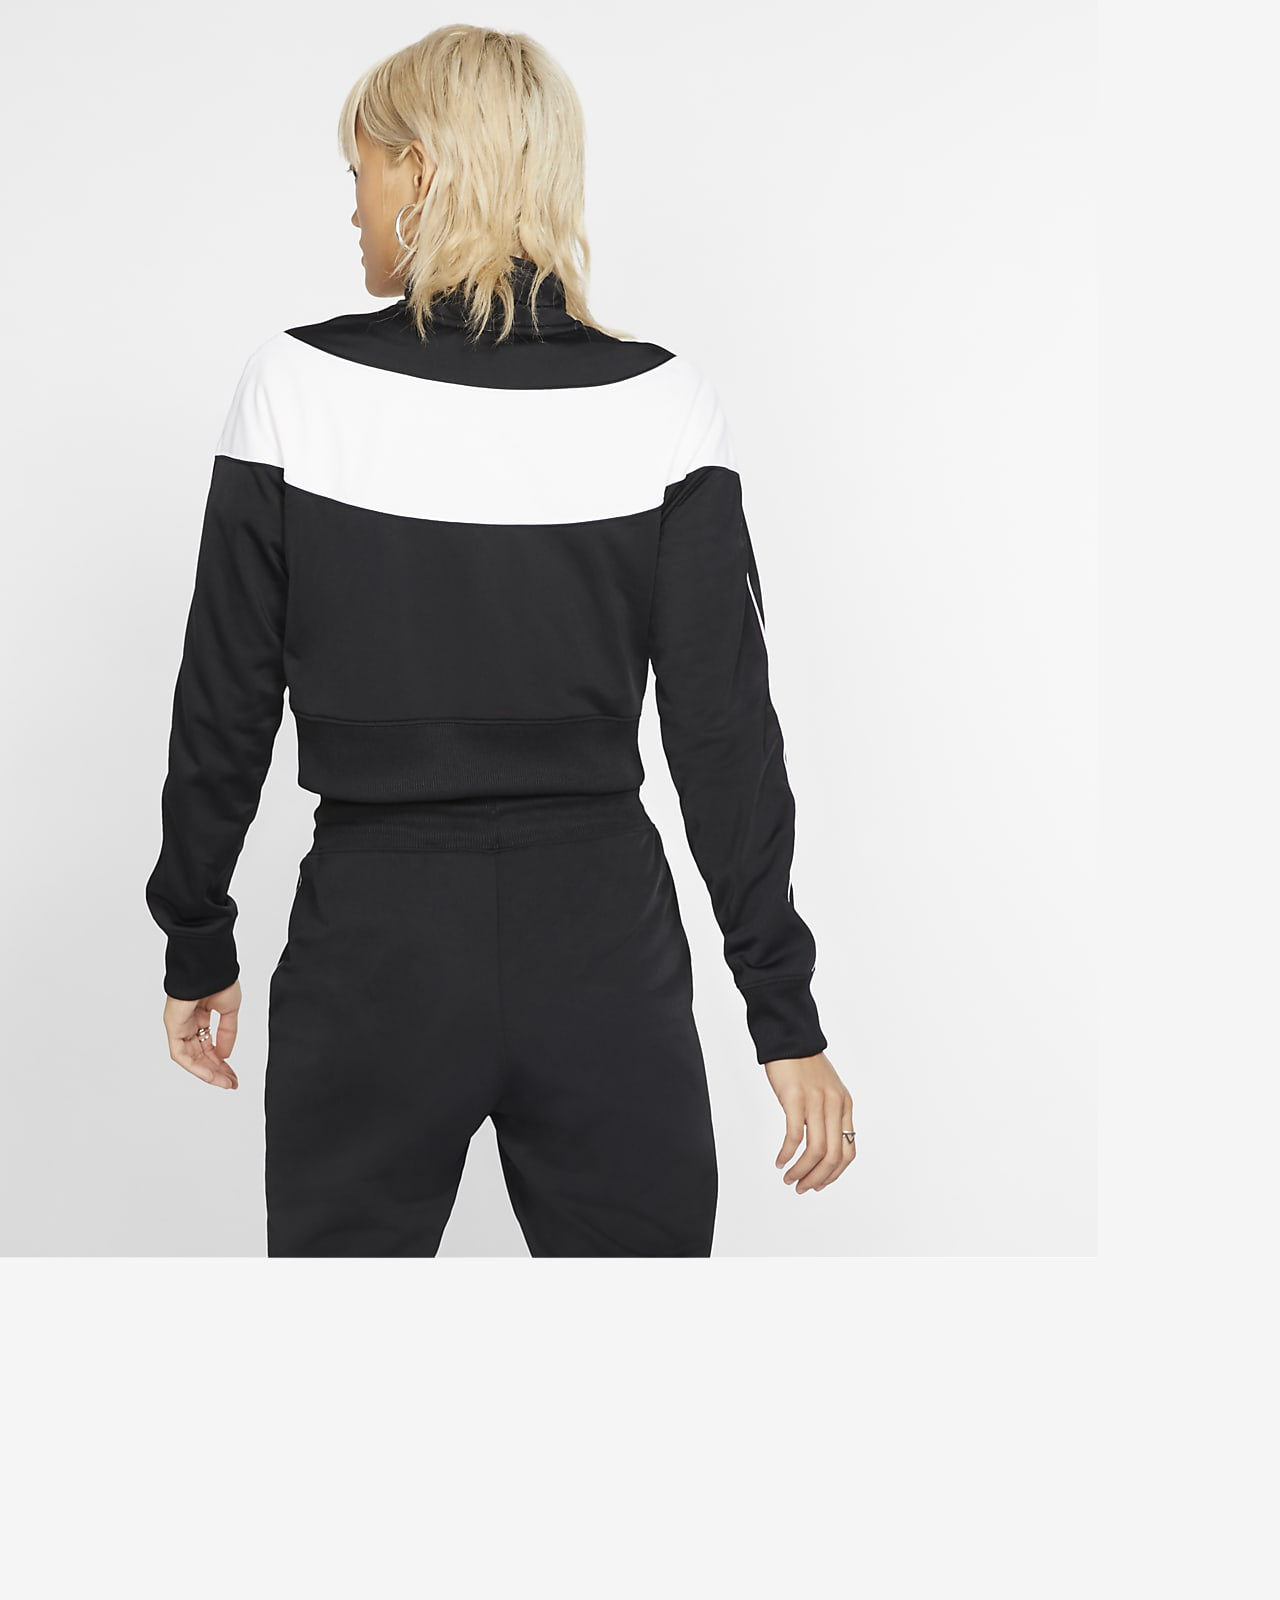 Veste de survêtement Nike Sportswear Heritage pour Femme